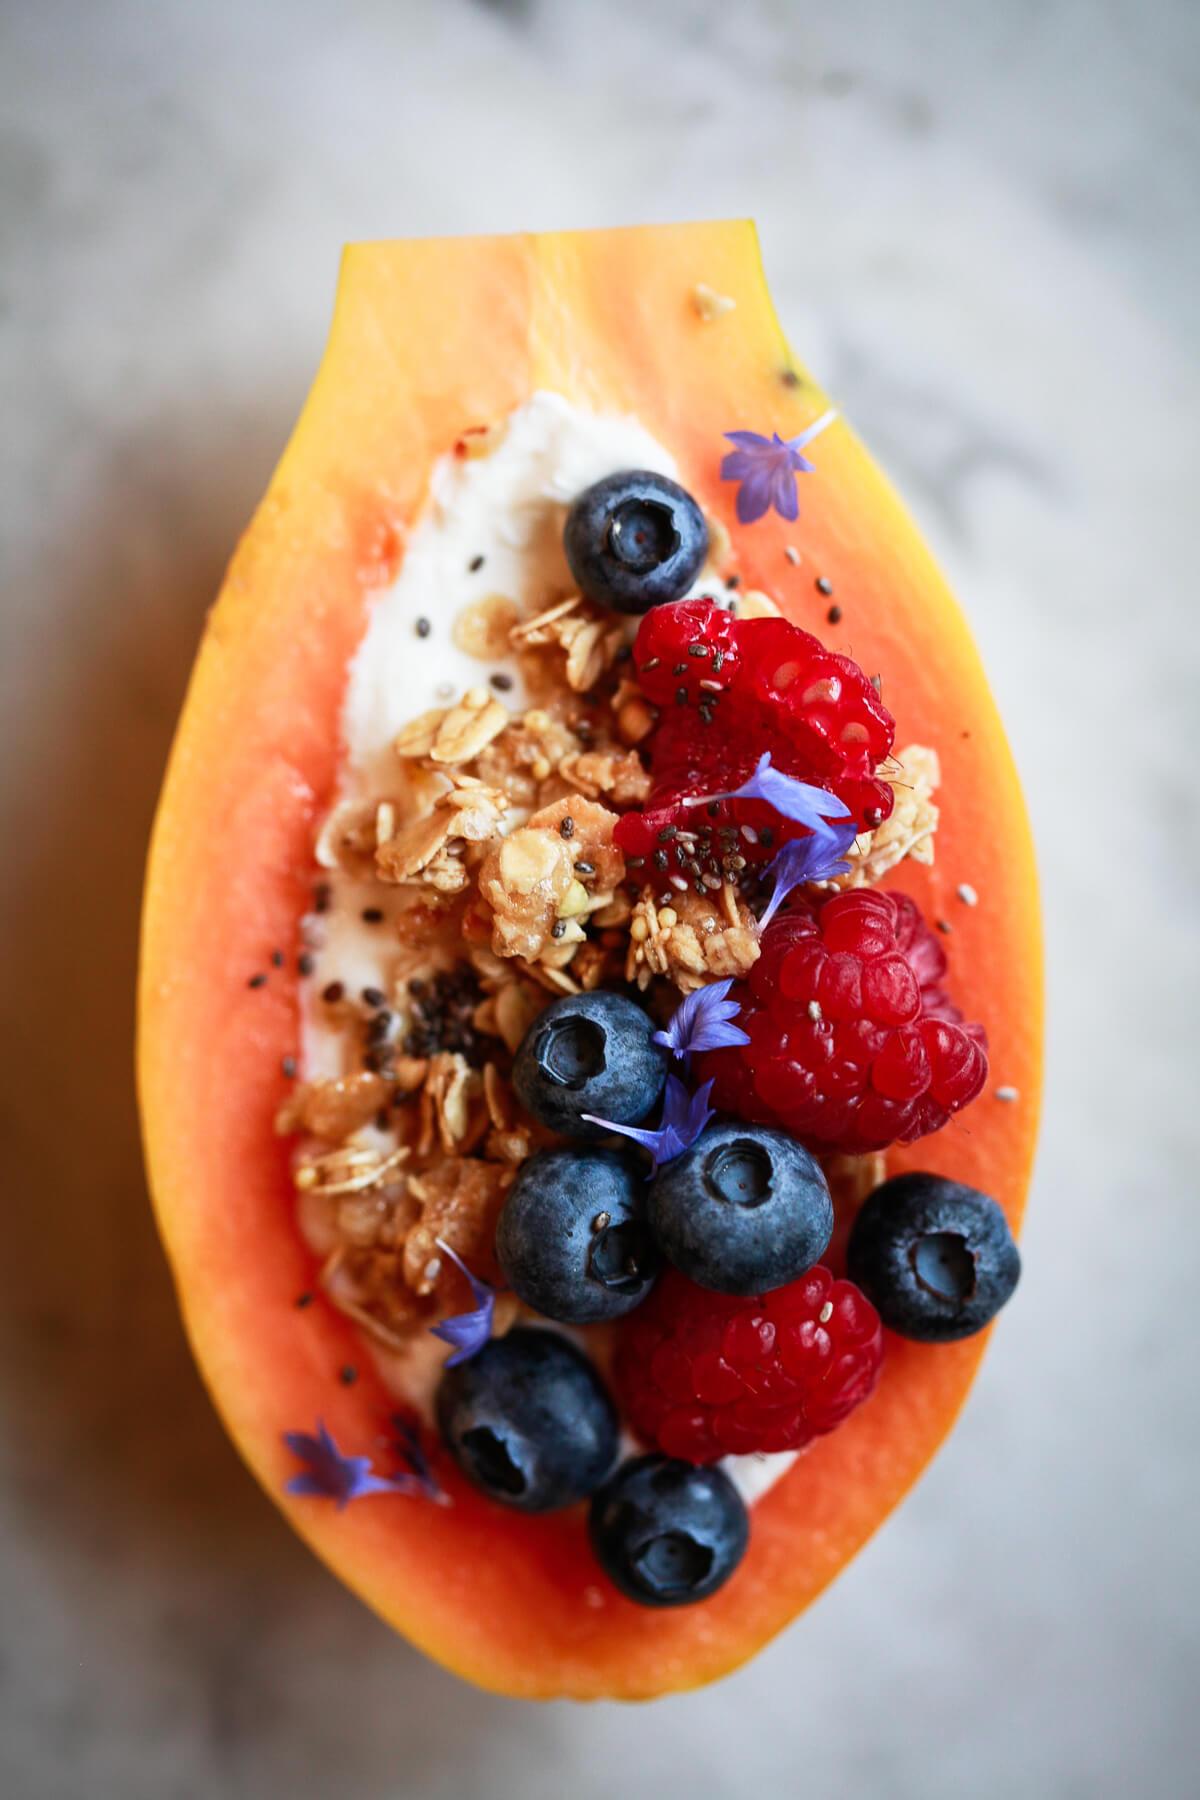 An overhead photo of half a Hawaiian papaya filled with plain yogurt, granola, fresh berries, and chia seeds.